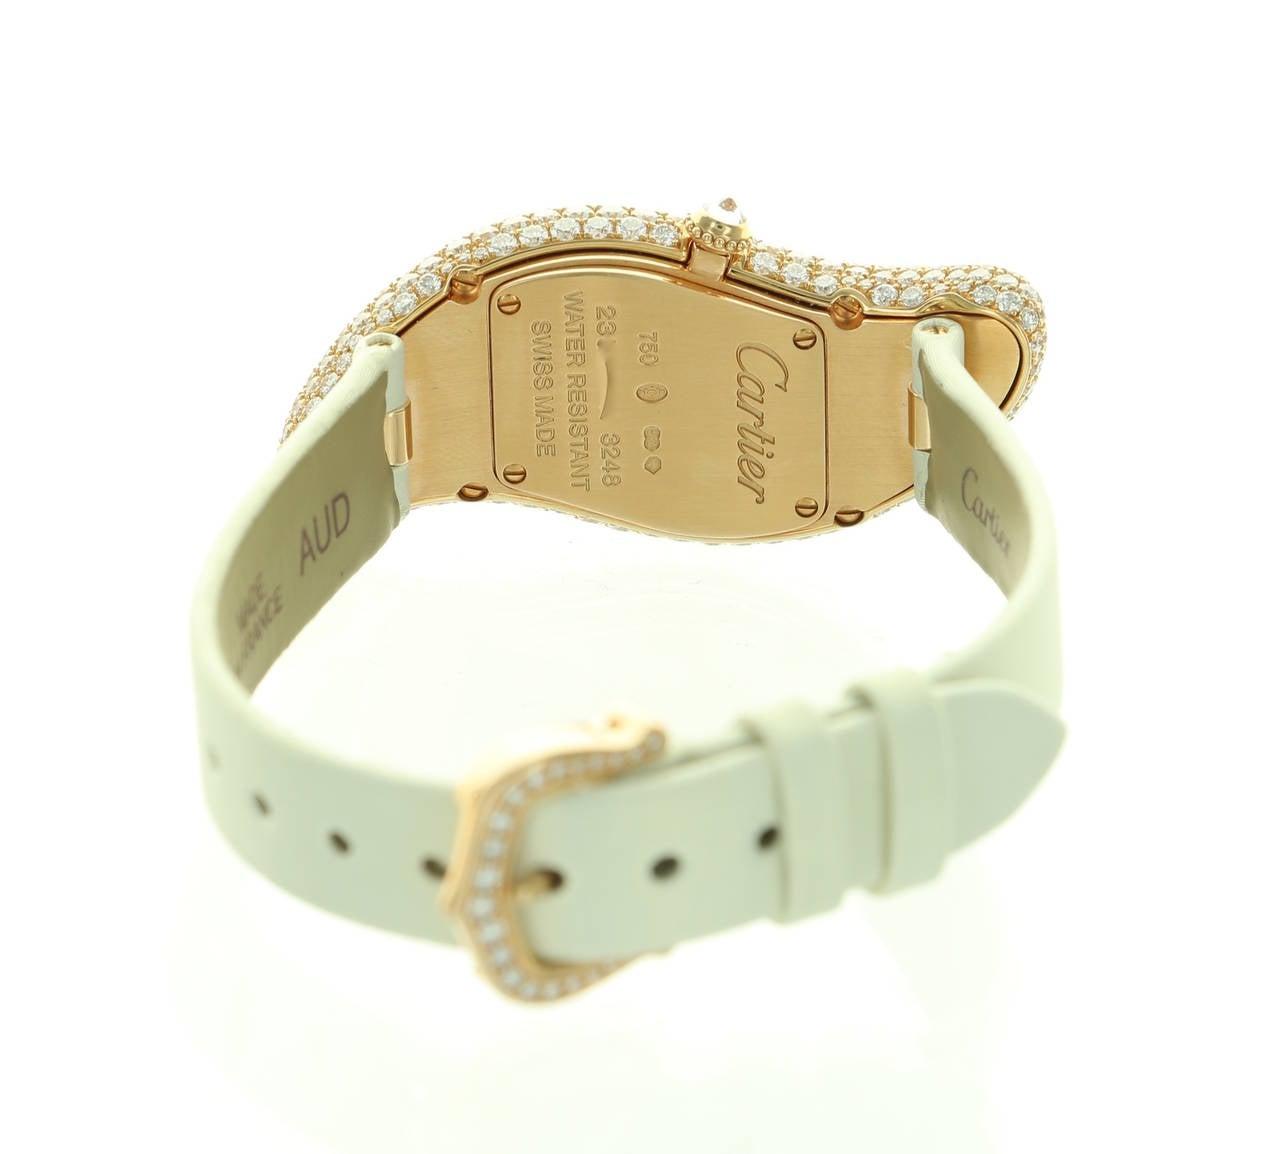 Cartier Lady's Rose Gold Baignoire Wristwatch Ref 3248 5